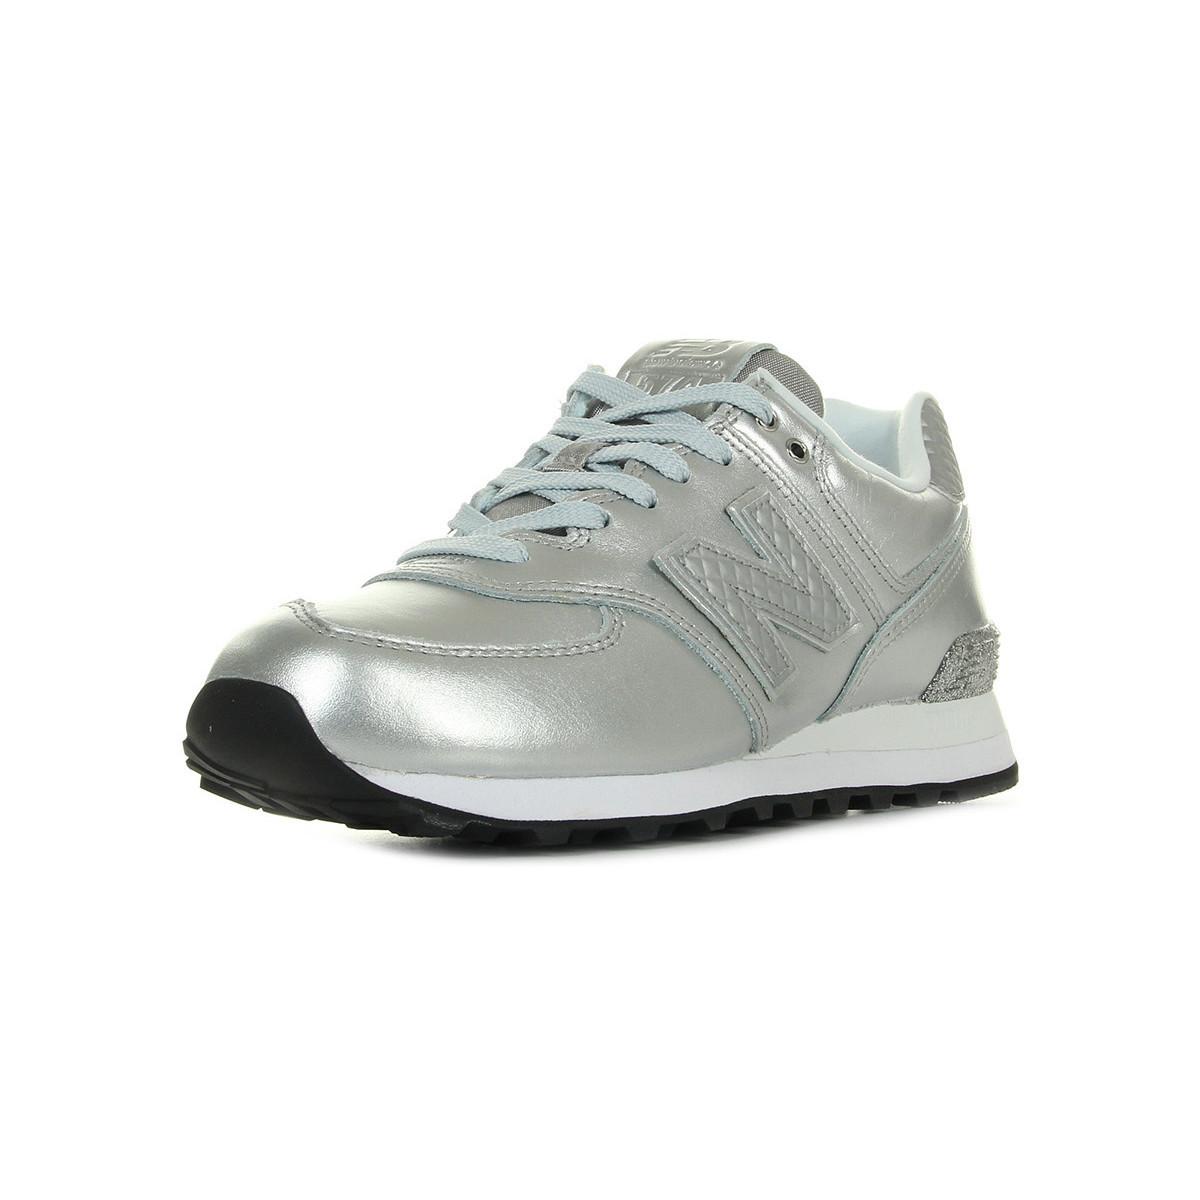 Reebok Classic Leather Seasonal II Suede, Low-Top Sneaker Femme, Violett (Sport Violet/Coral/White), 38